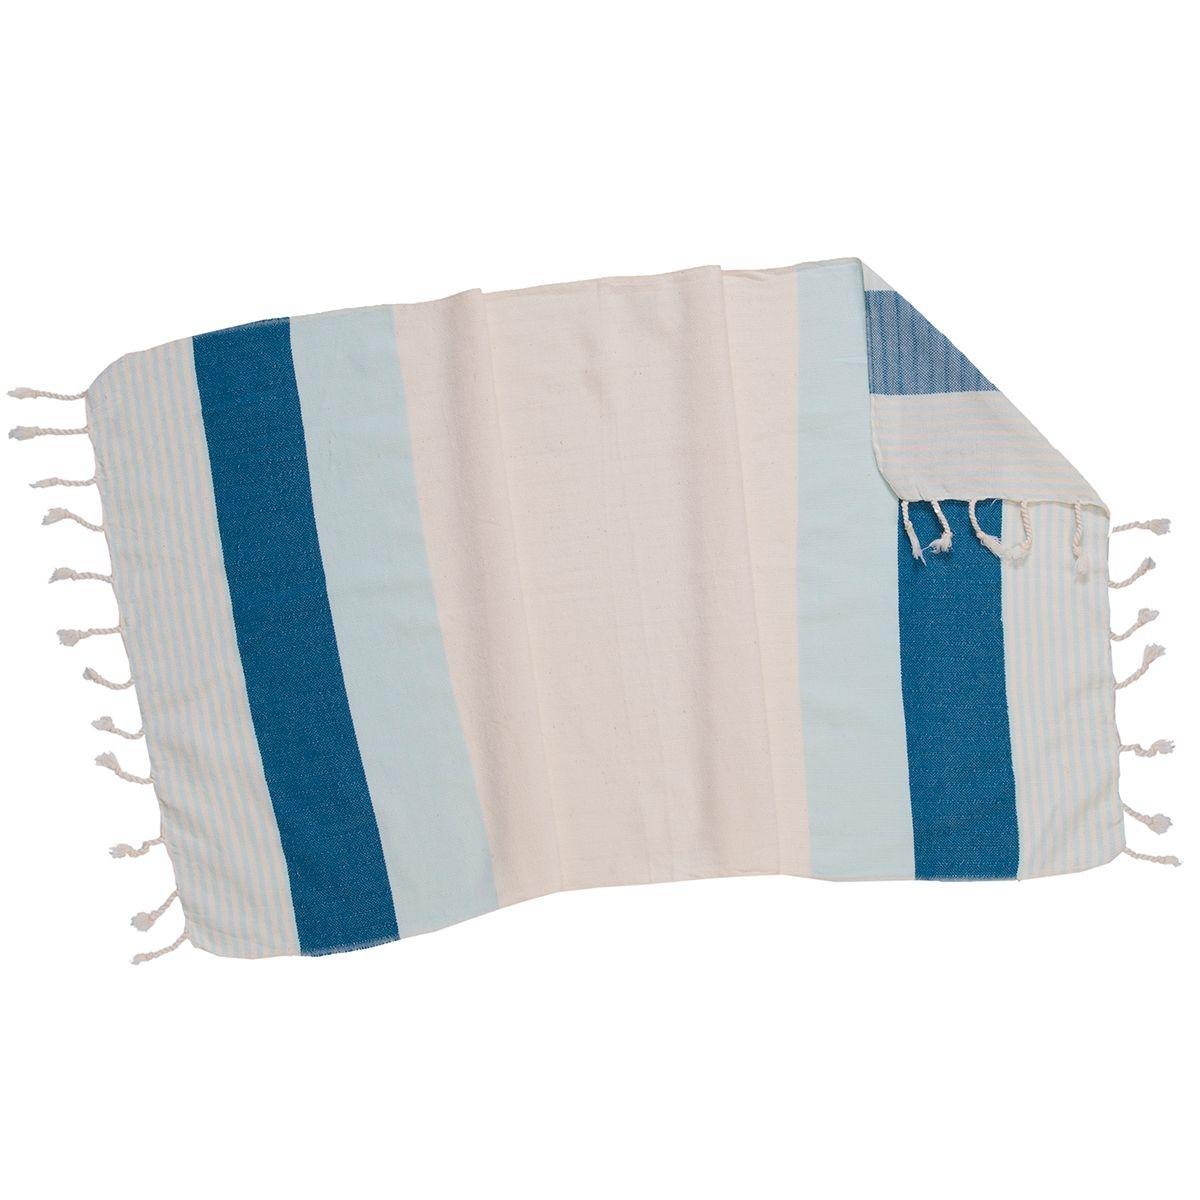 Peşkir İkiz Sultan - Buz Mavi / Petrol Mavi